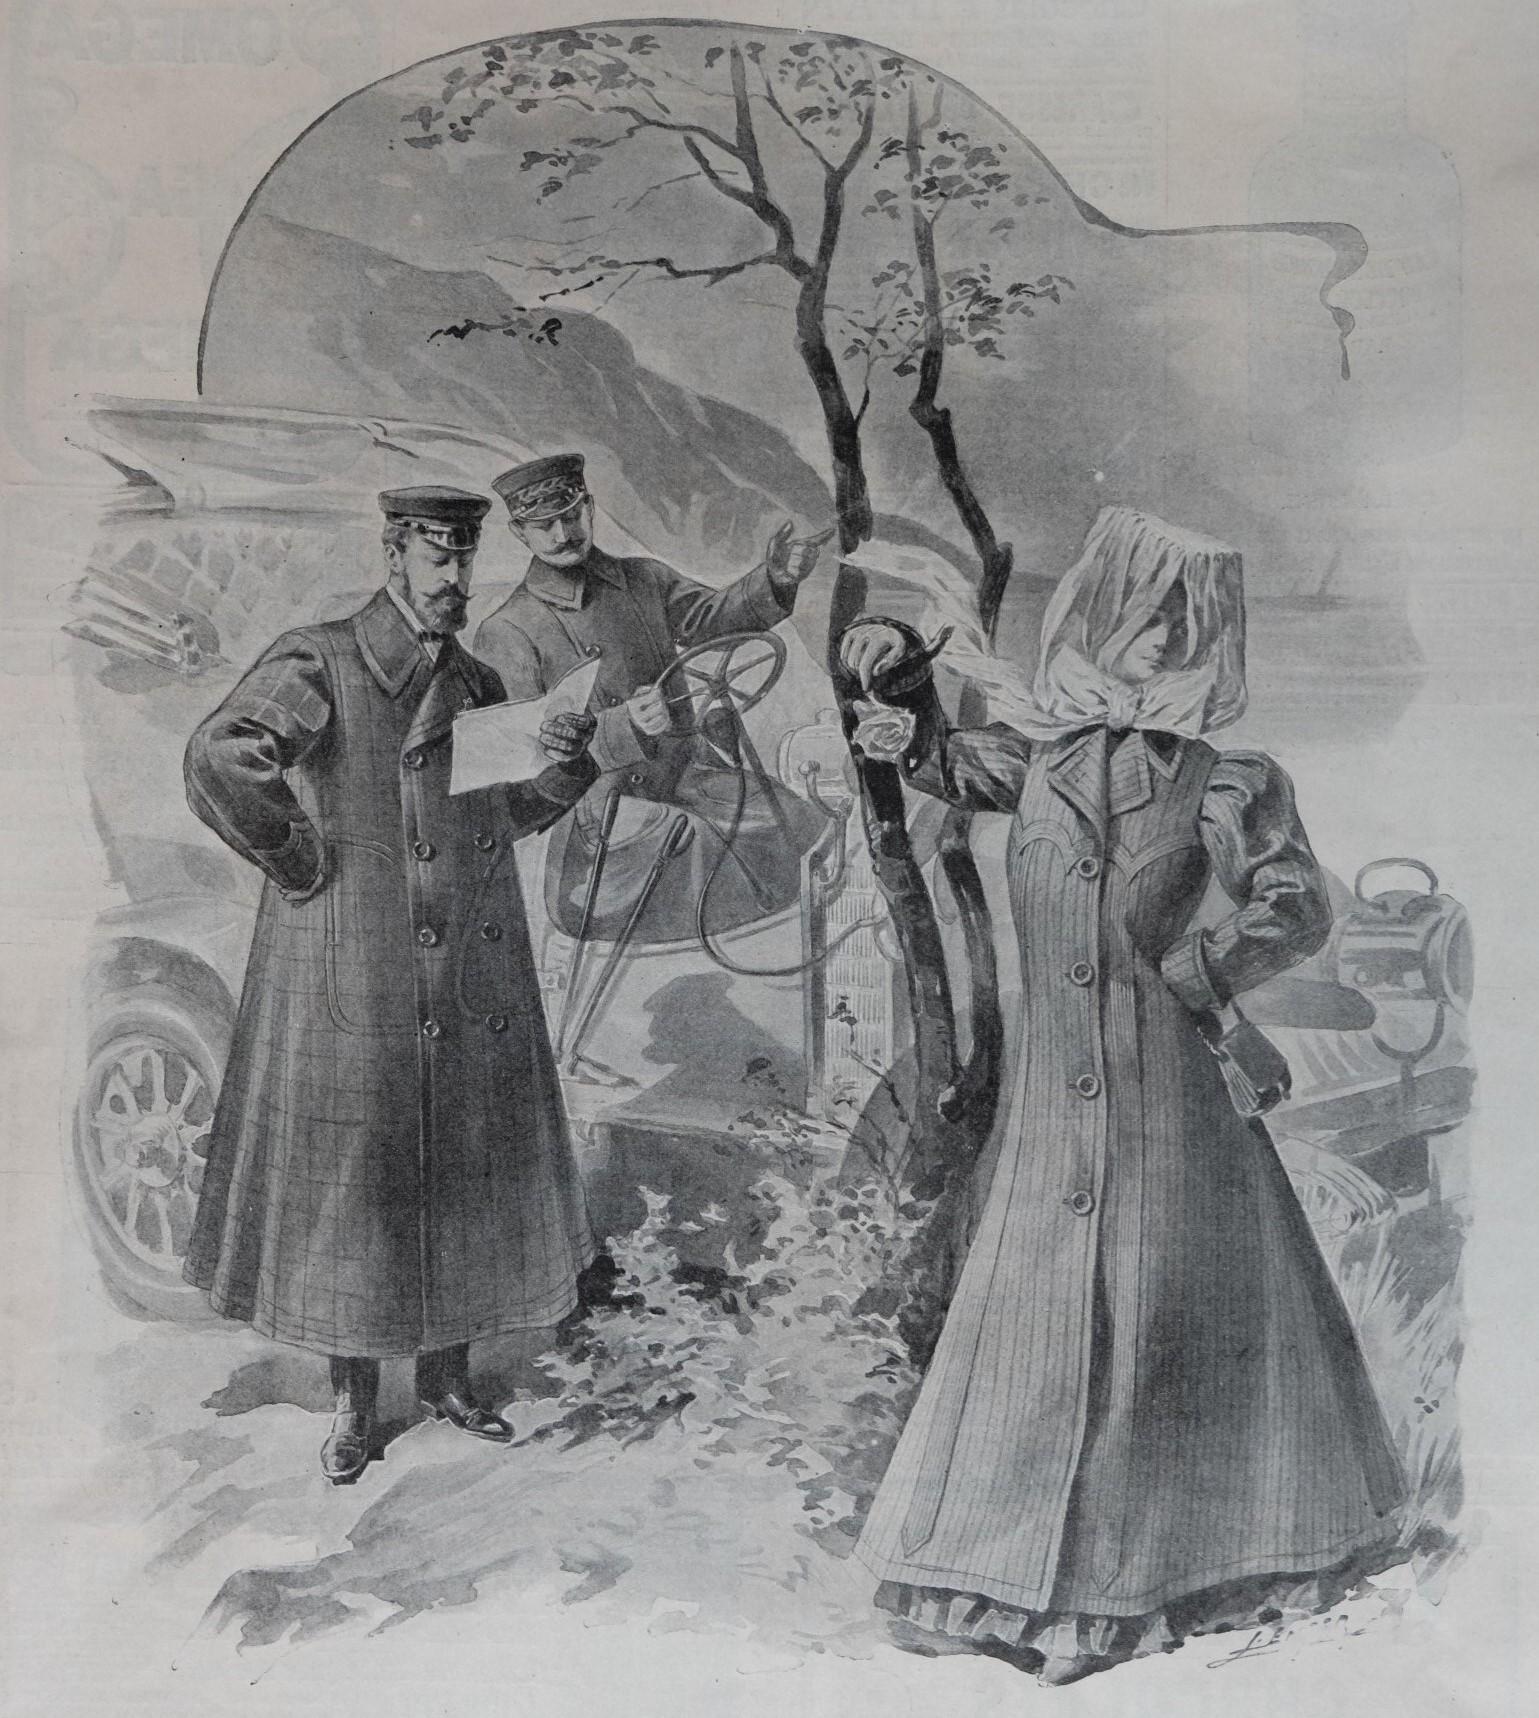 La vie de chauffeur en 1906